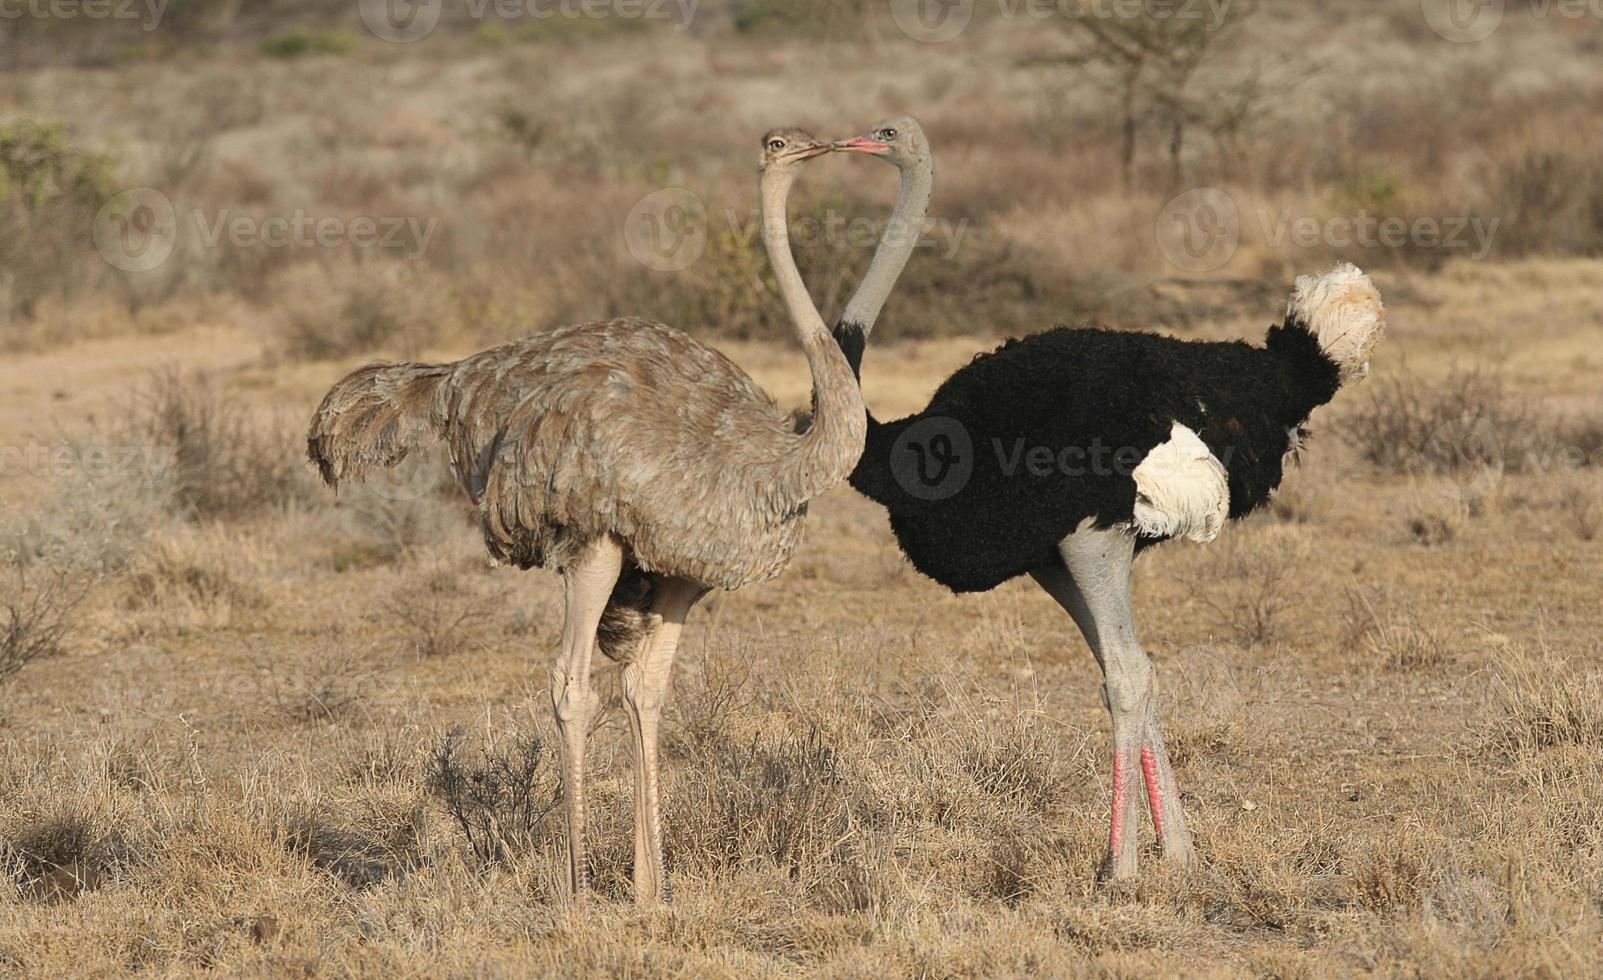 beijando avestruzes - avestruz somaliano, struthio molubdophanes, buffalo springs, quênia foto